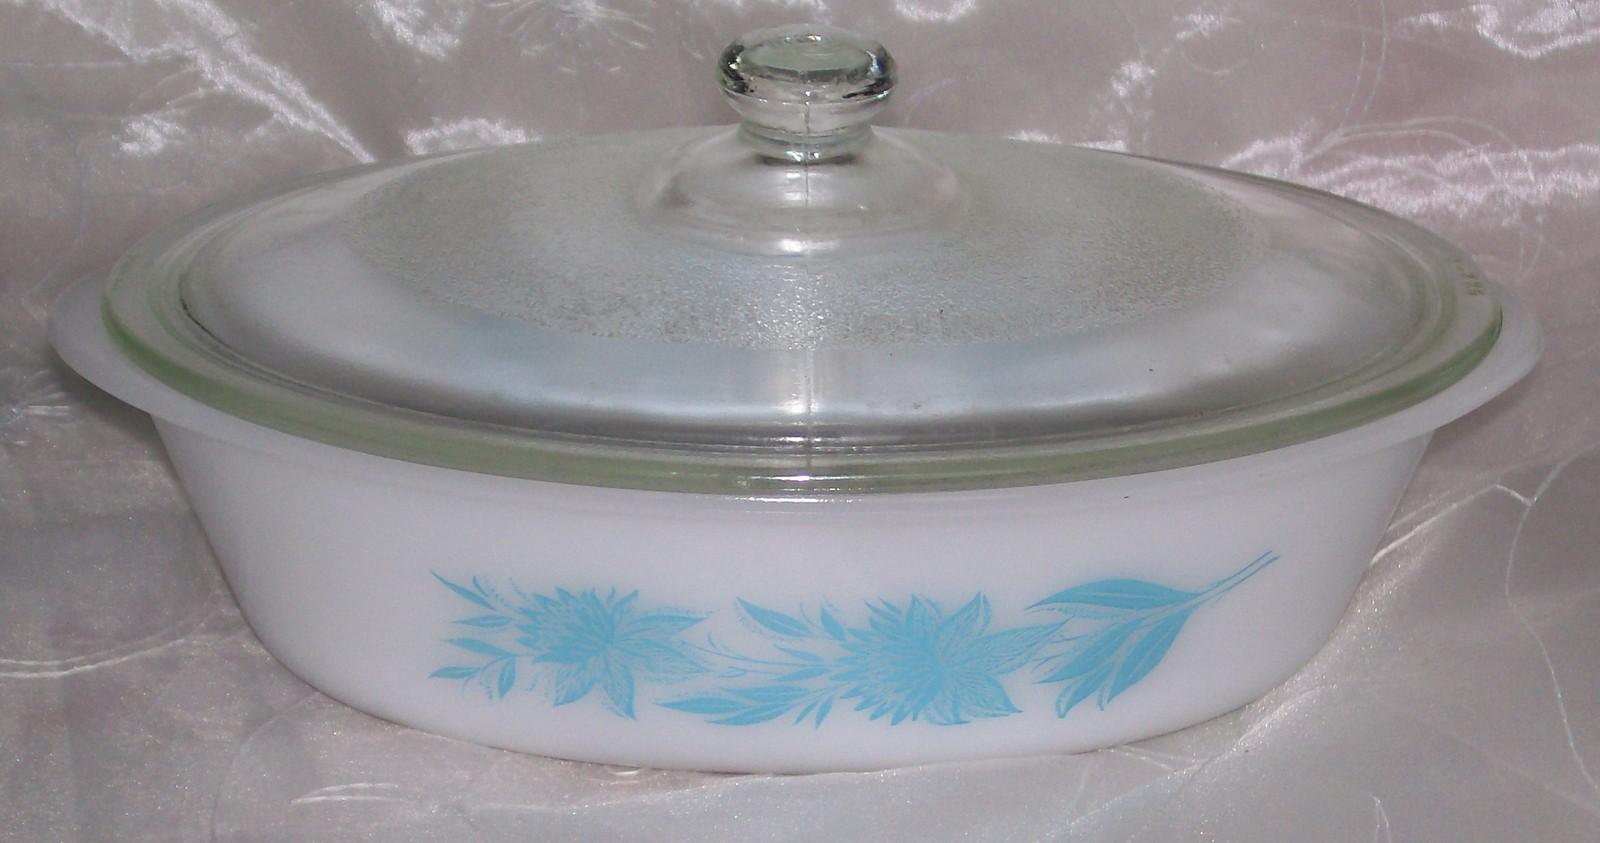 Vtg Glasbake Jeannette Oval 1 QT Casserole w/ Lid Aqua Blue Thistle Flowers VGUC